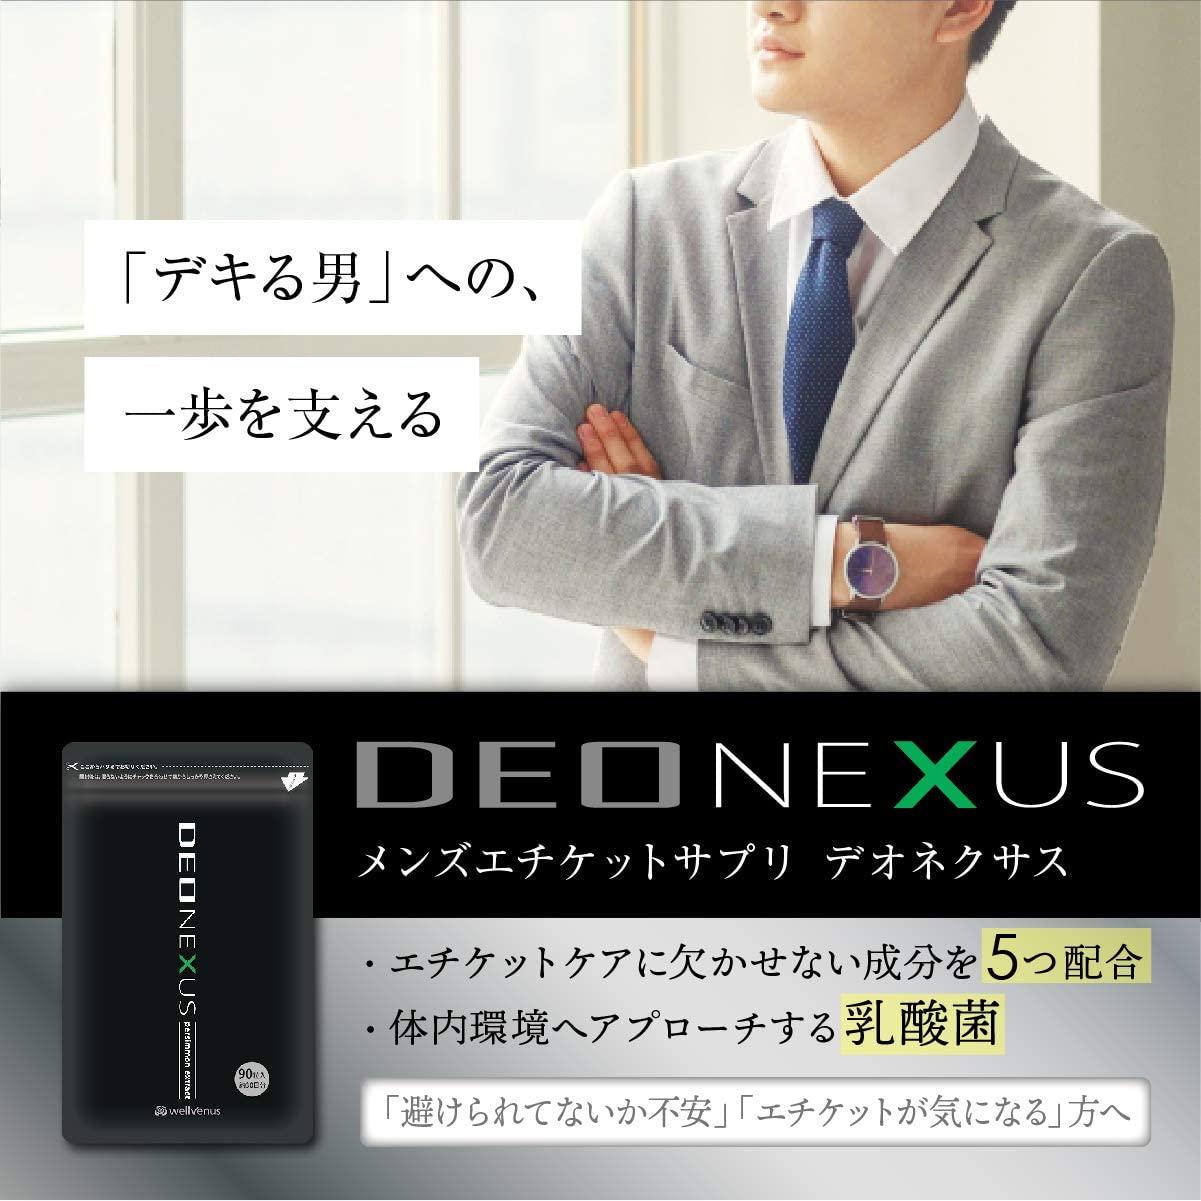 wellvenus(ウェルヴィーナス) DEO NEXUSの商品画像2